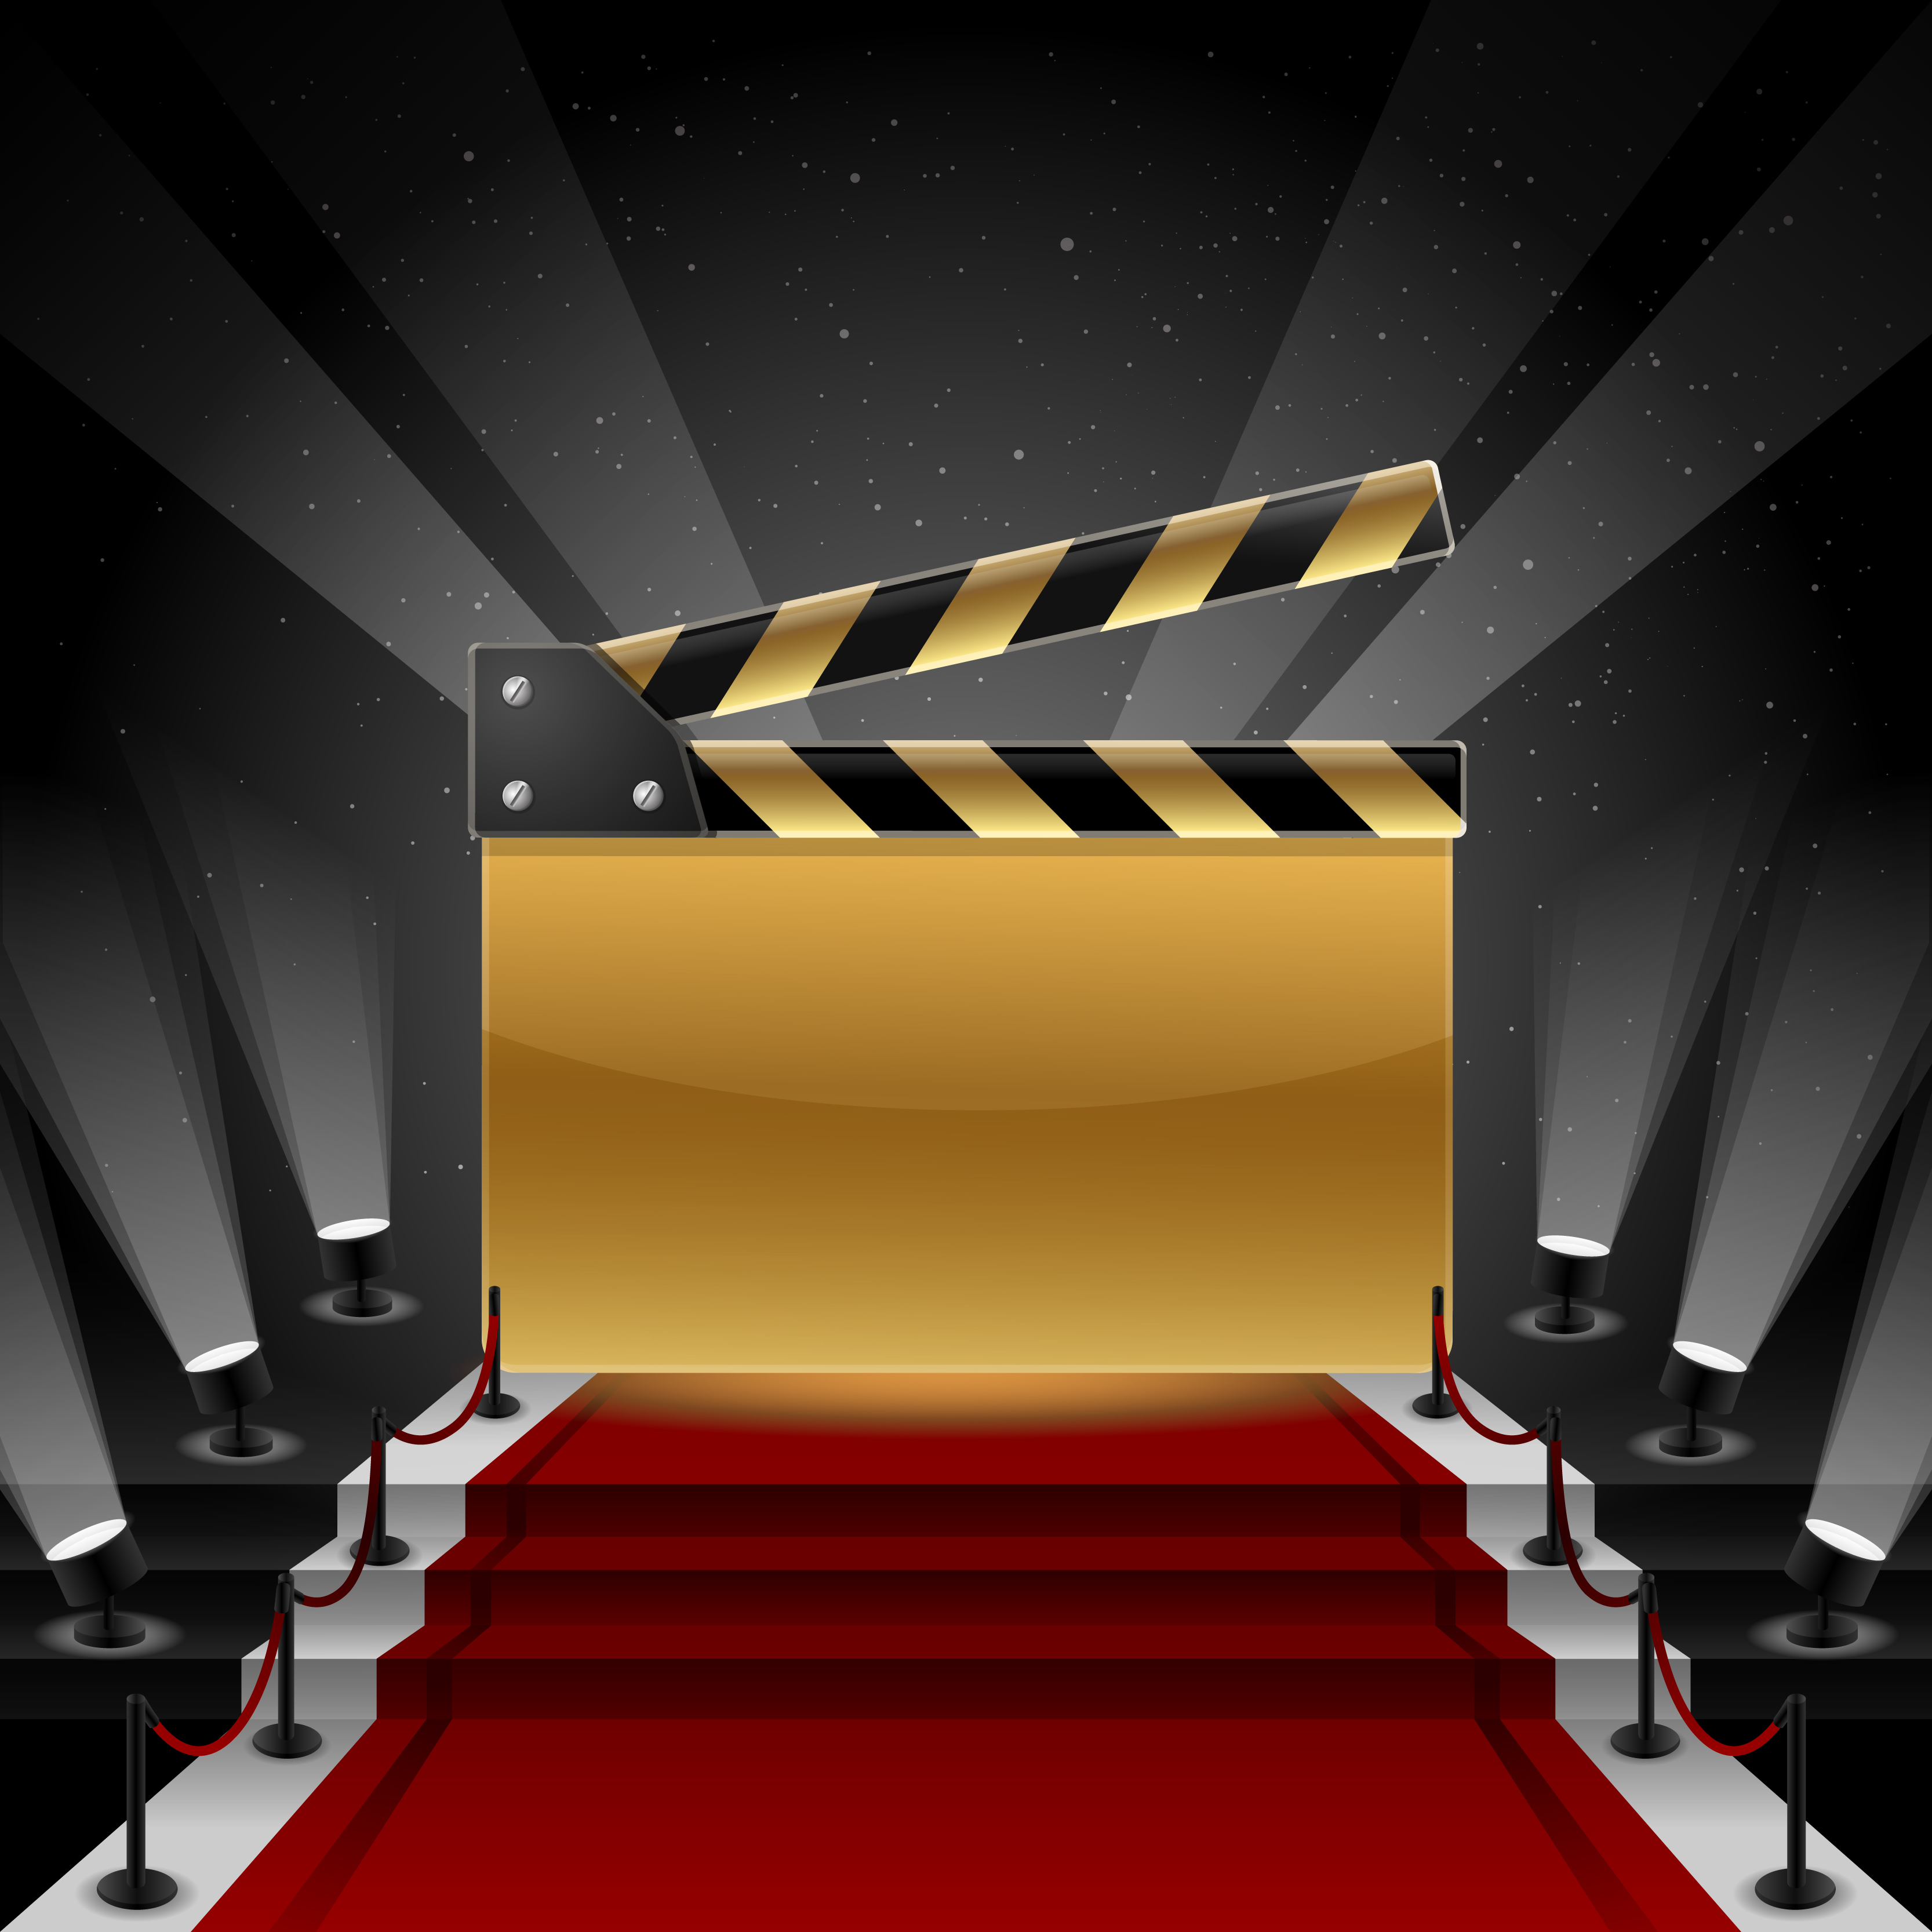 Free Movie Theme Cliparts, Download Free Clip Art, Free Clip.